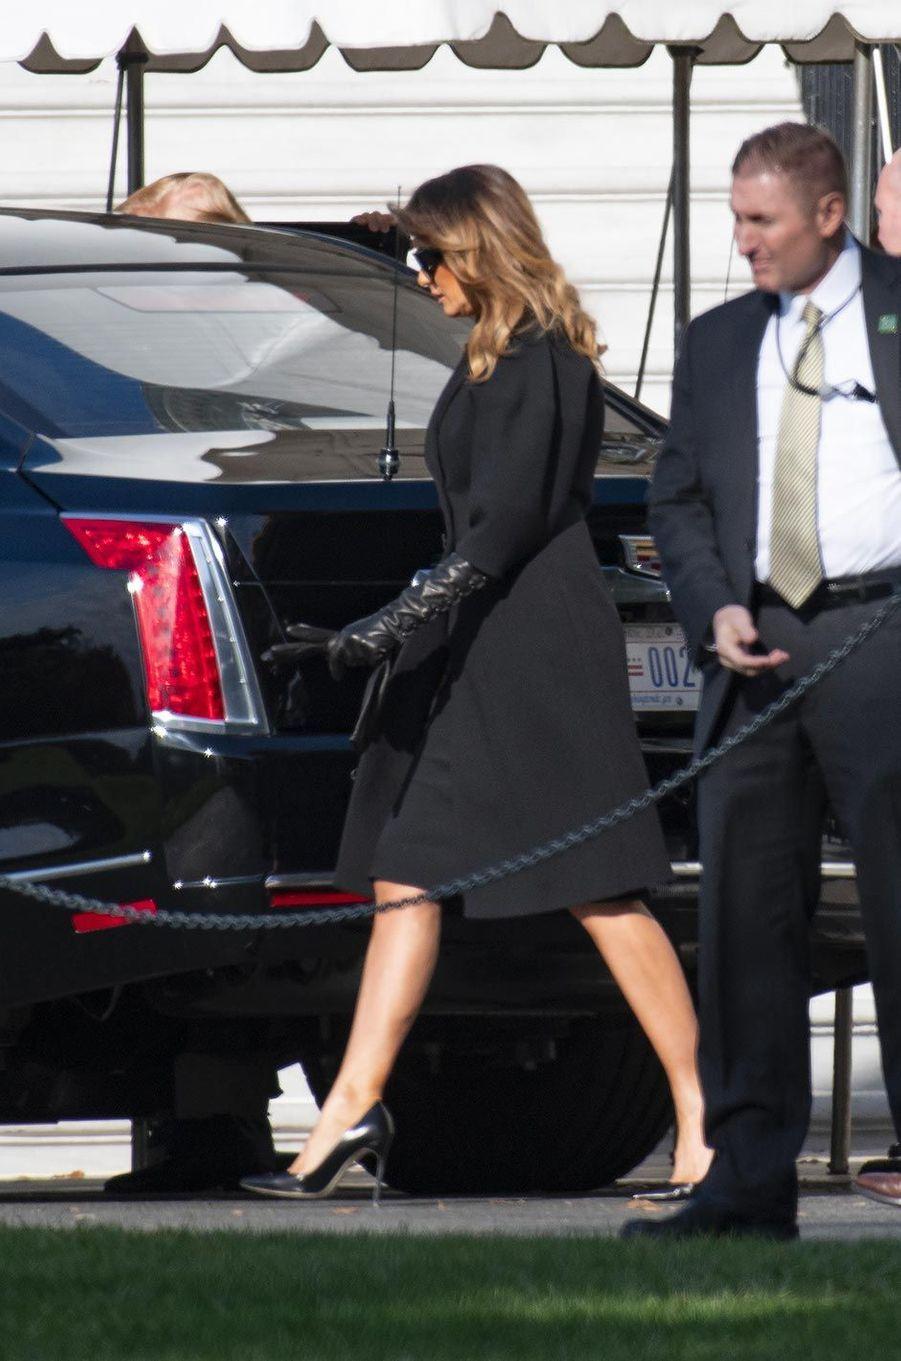 Melania Trump quittant la Maison-Blanche, le 8 novembre 2018.